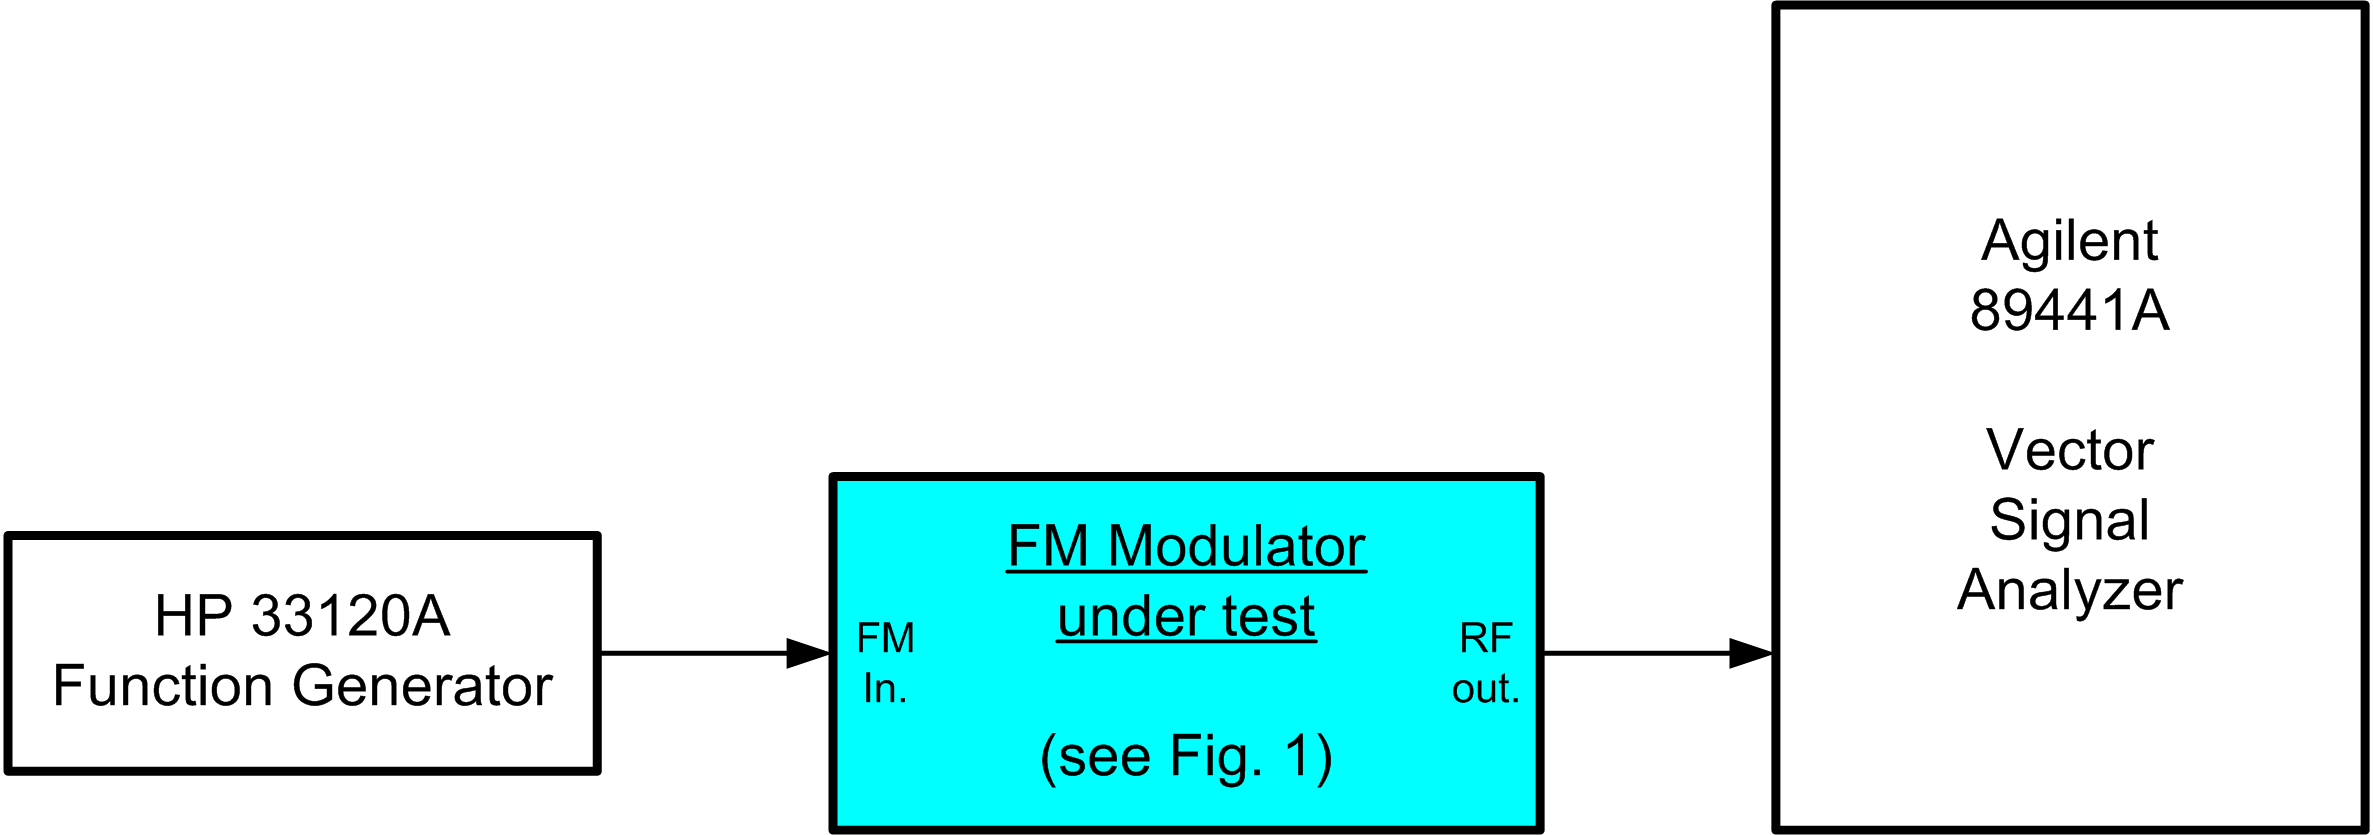 hight resolution of test setup for the fm modulator